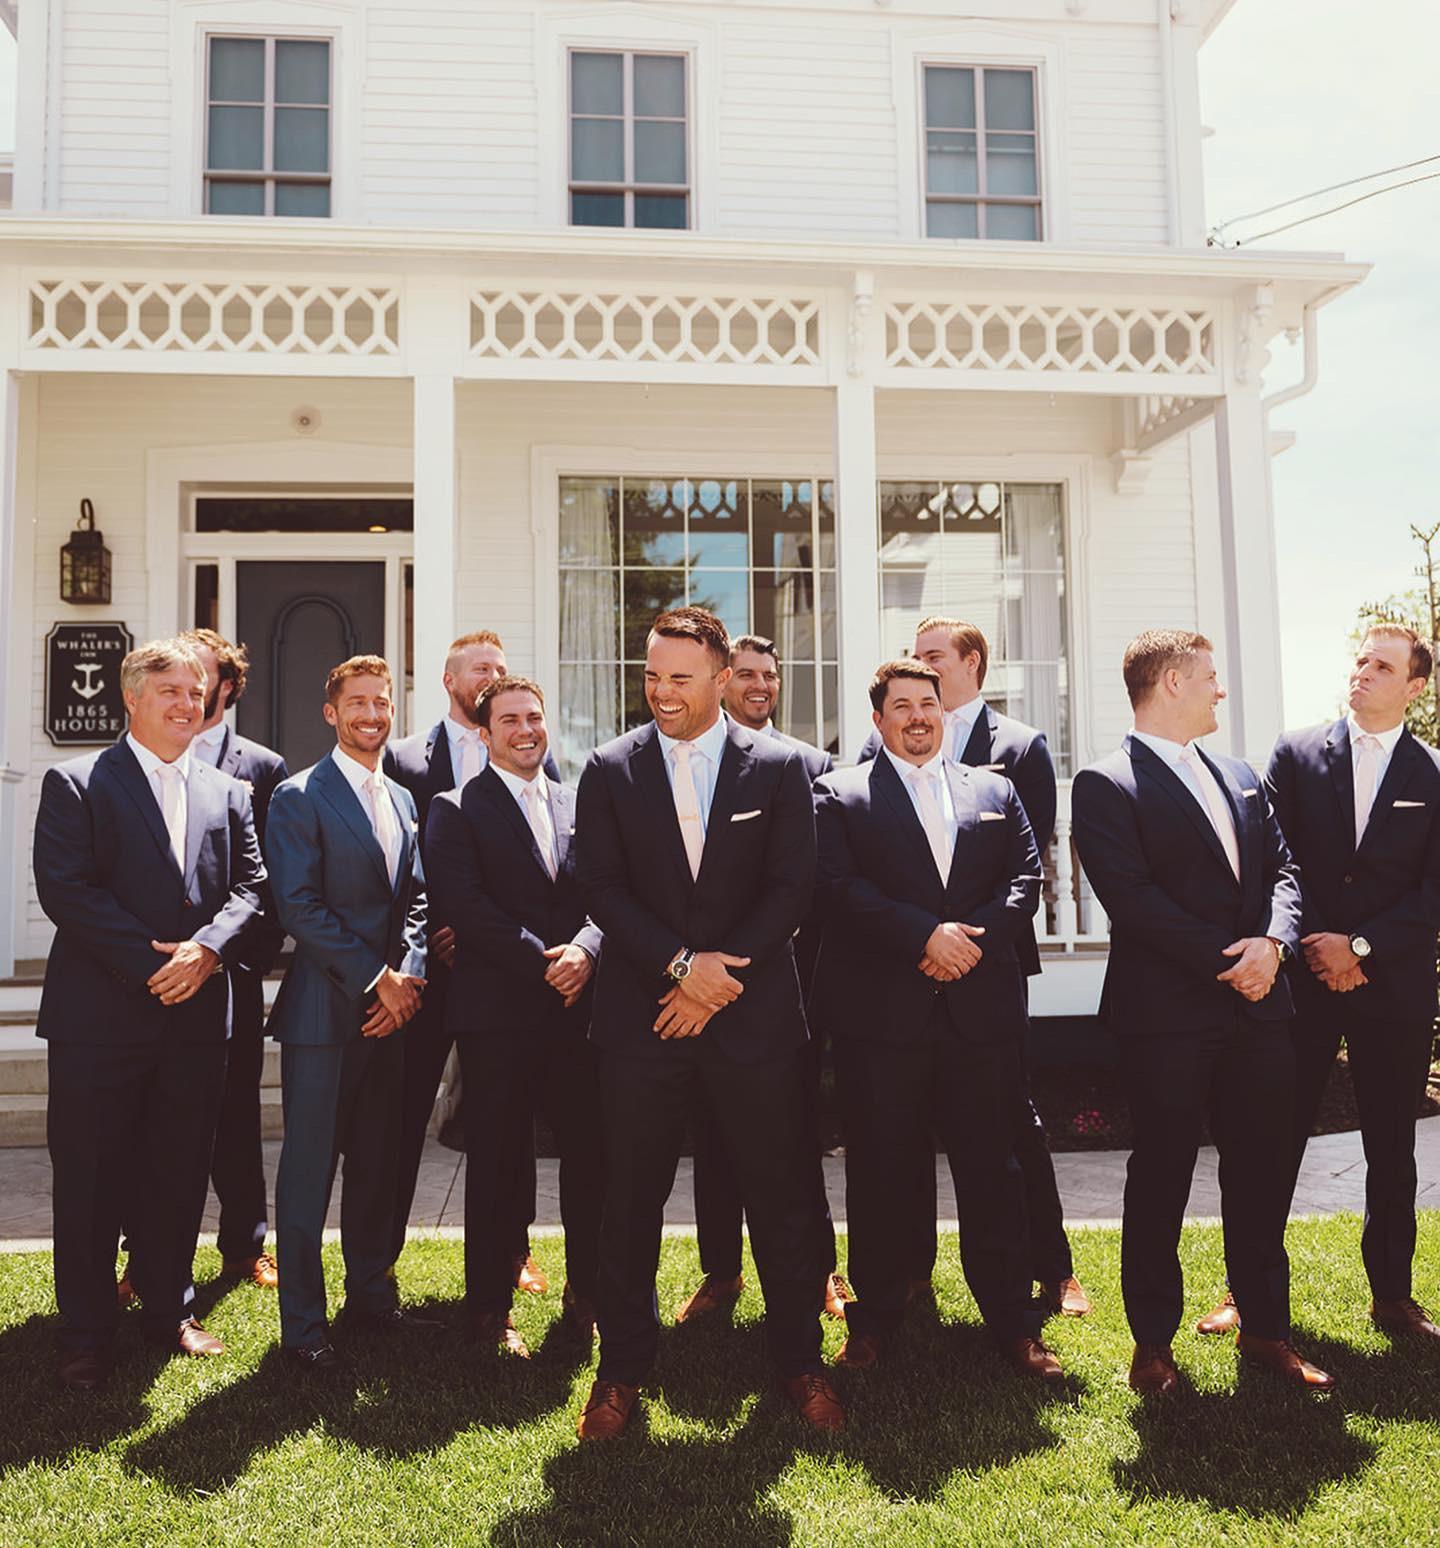 groom and wedding party mystic.jpeg